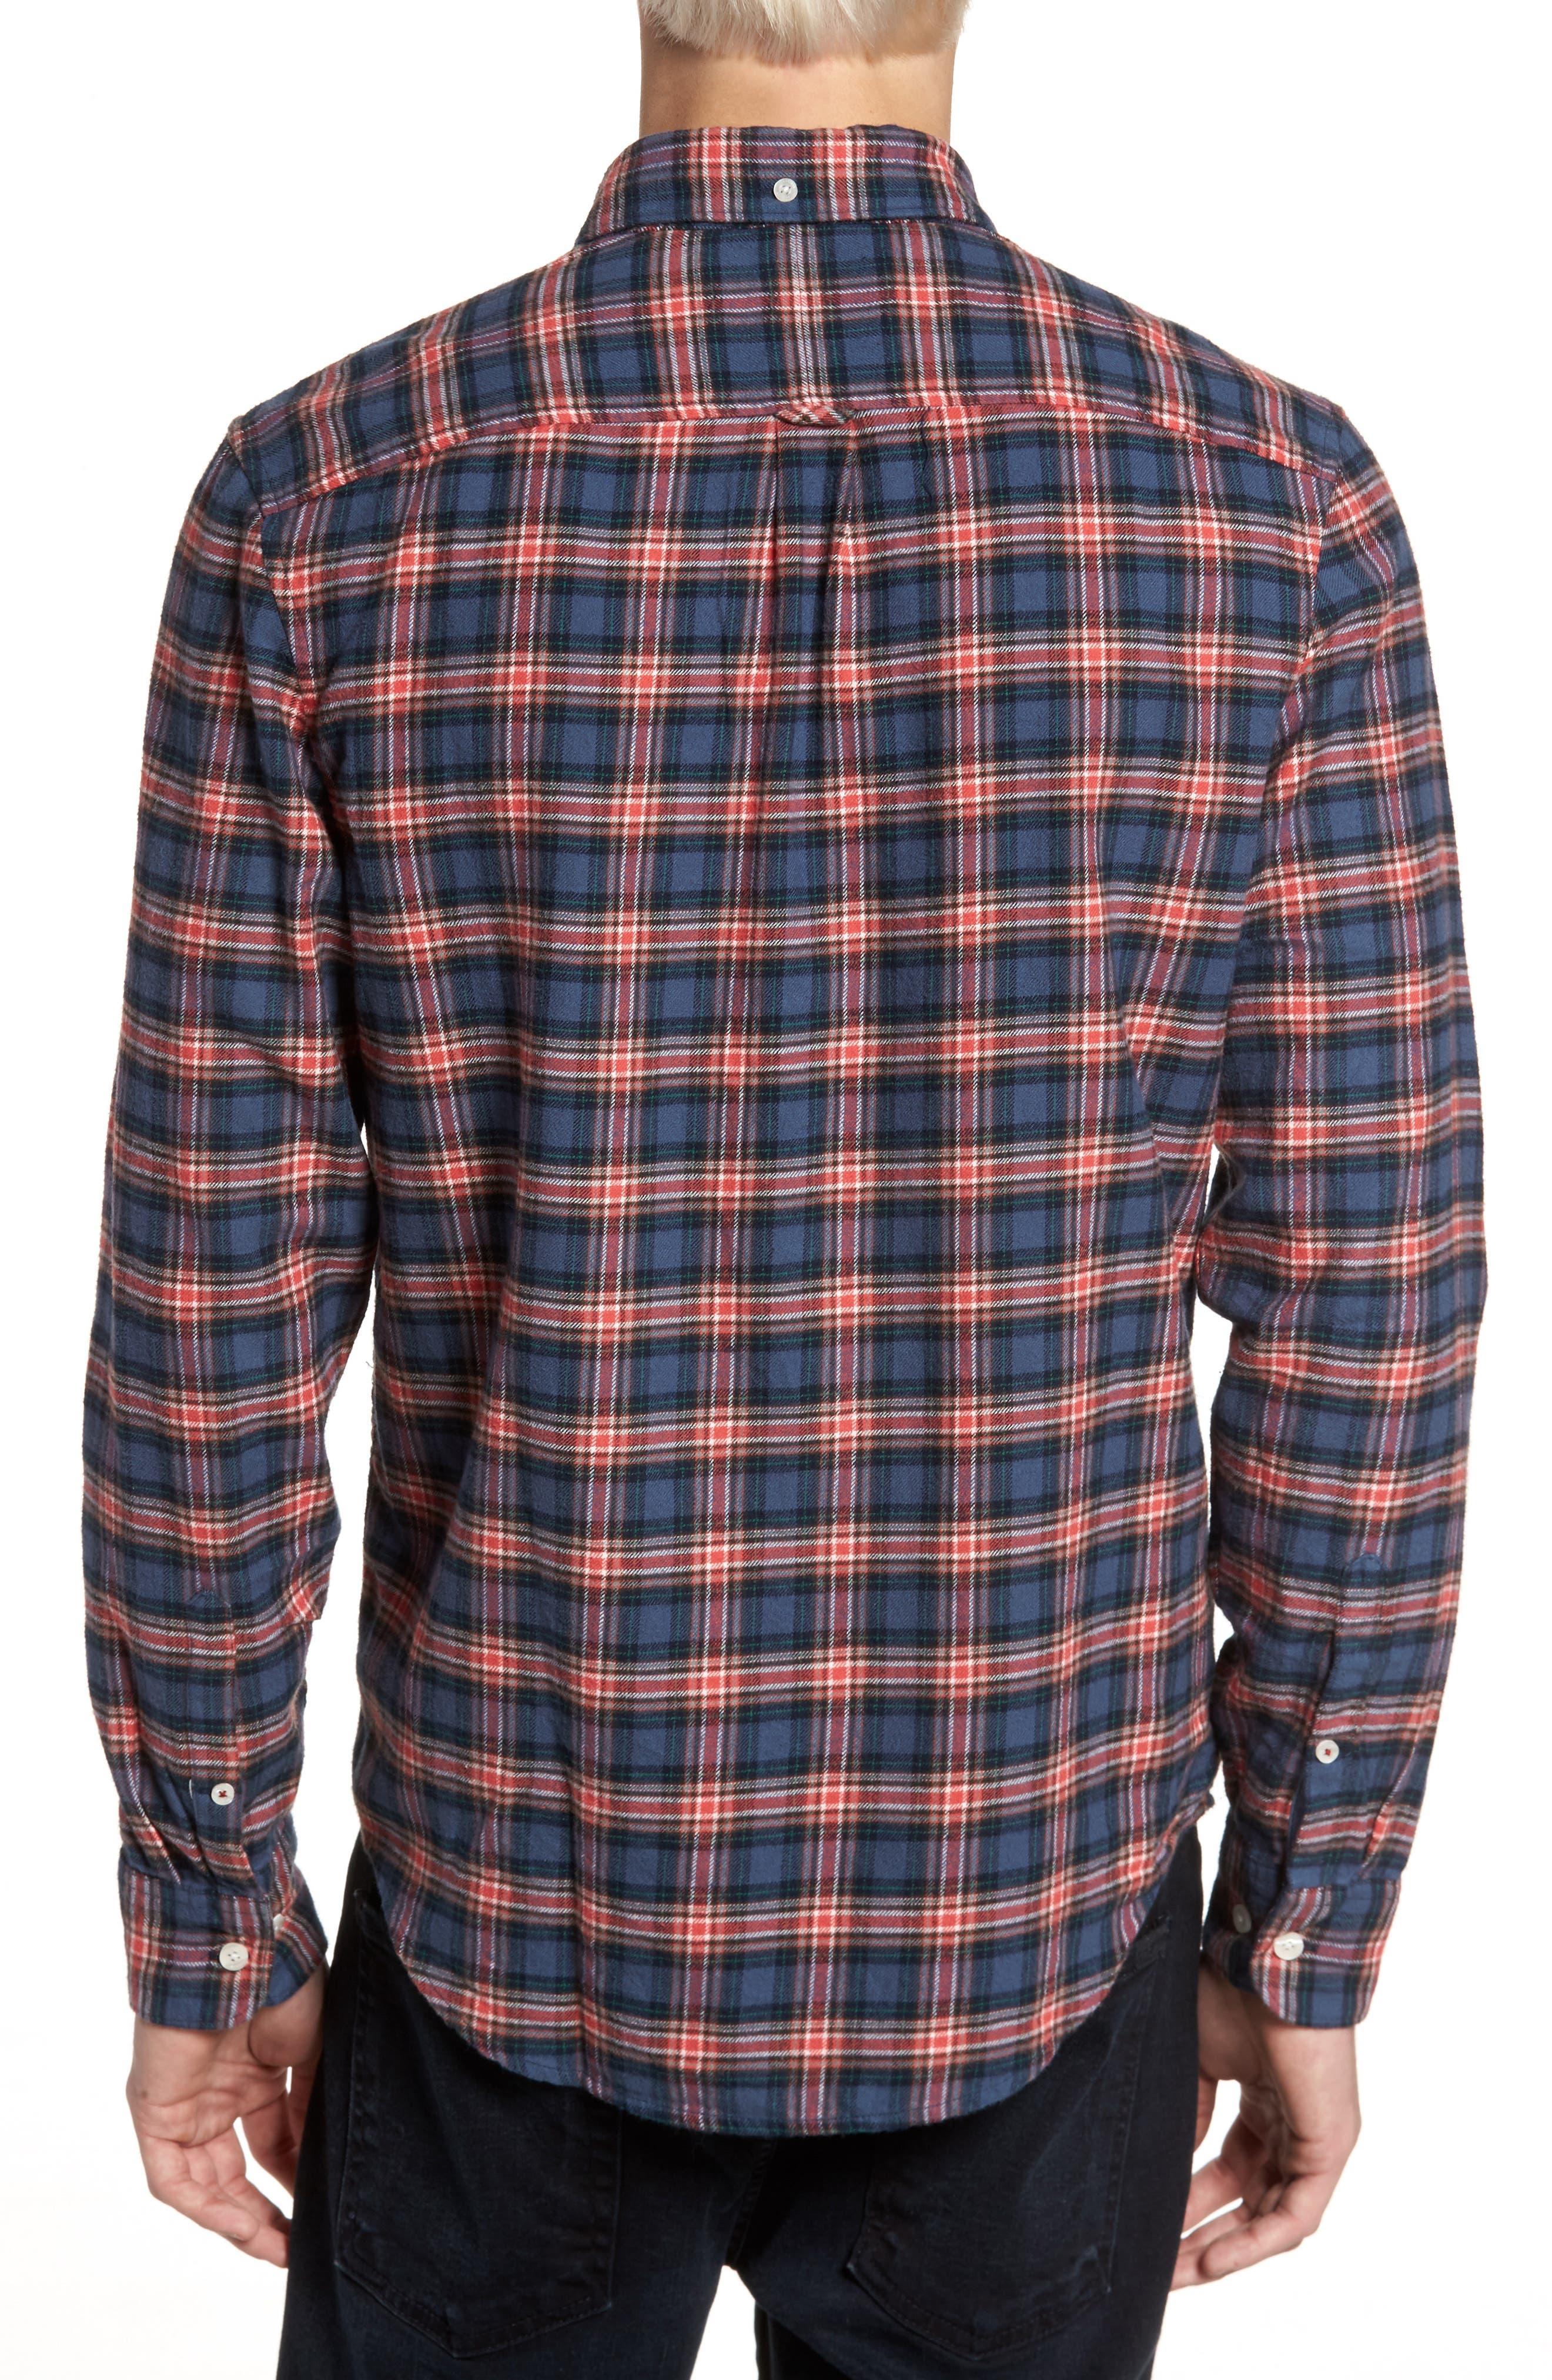 P55 Heritage Flannel Shirt,                             Alternate thumbnail 2, color,                             413